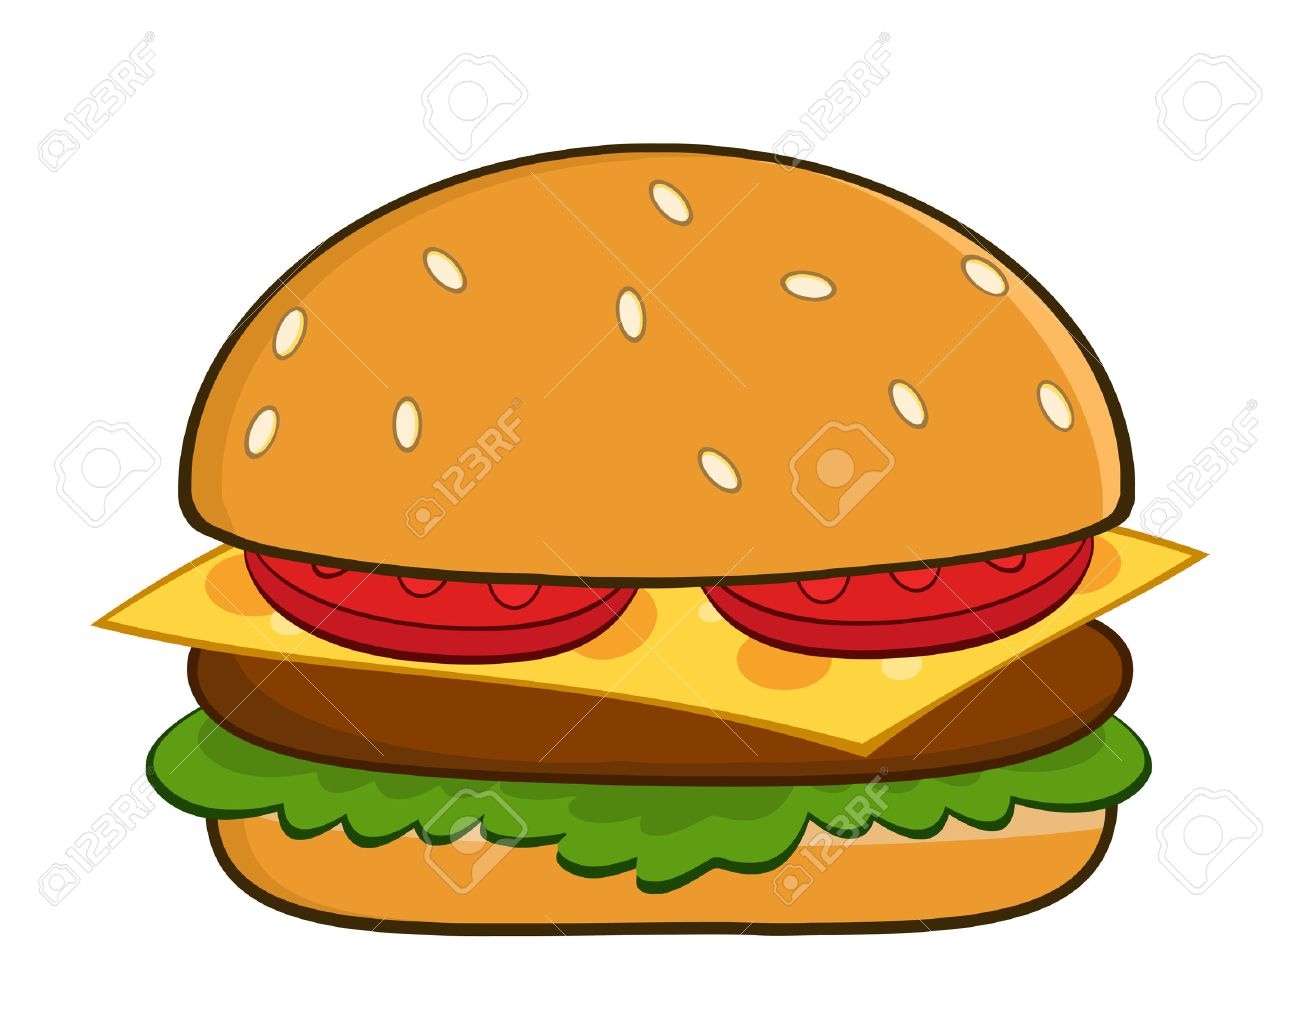 hamburger cartoon illustration isolated on white royalty free rh 123rf com cartoon hamburger guy cartoon hamburger guy